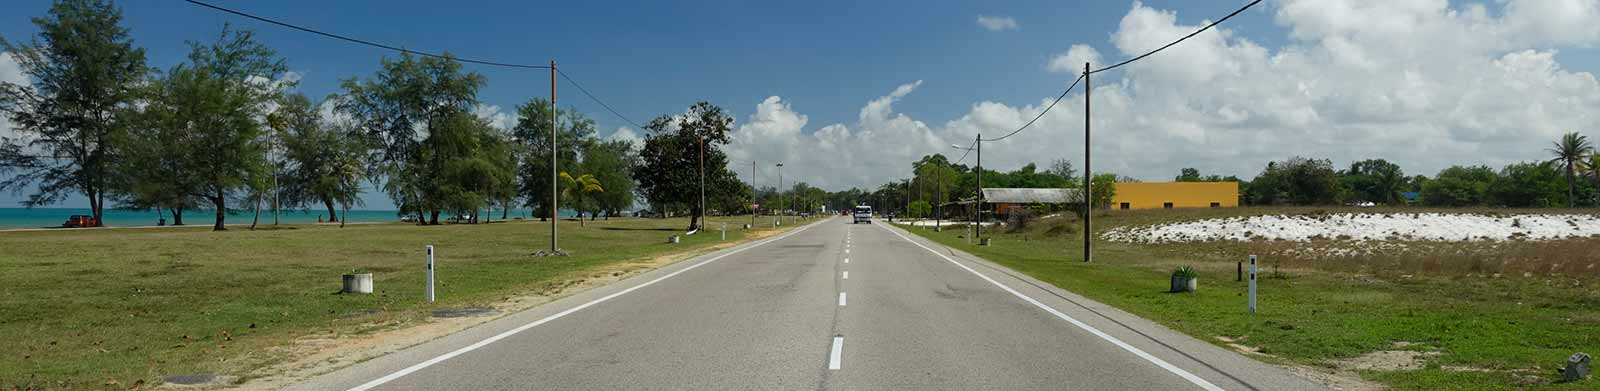 Landstraße nach Kuala Terengganu